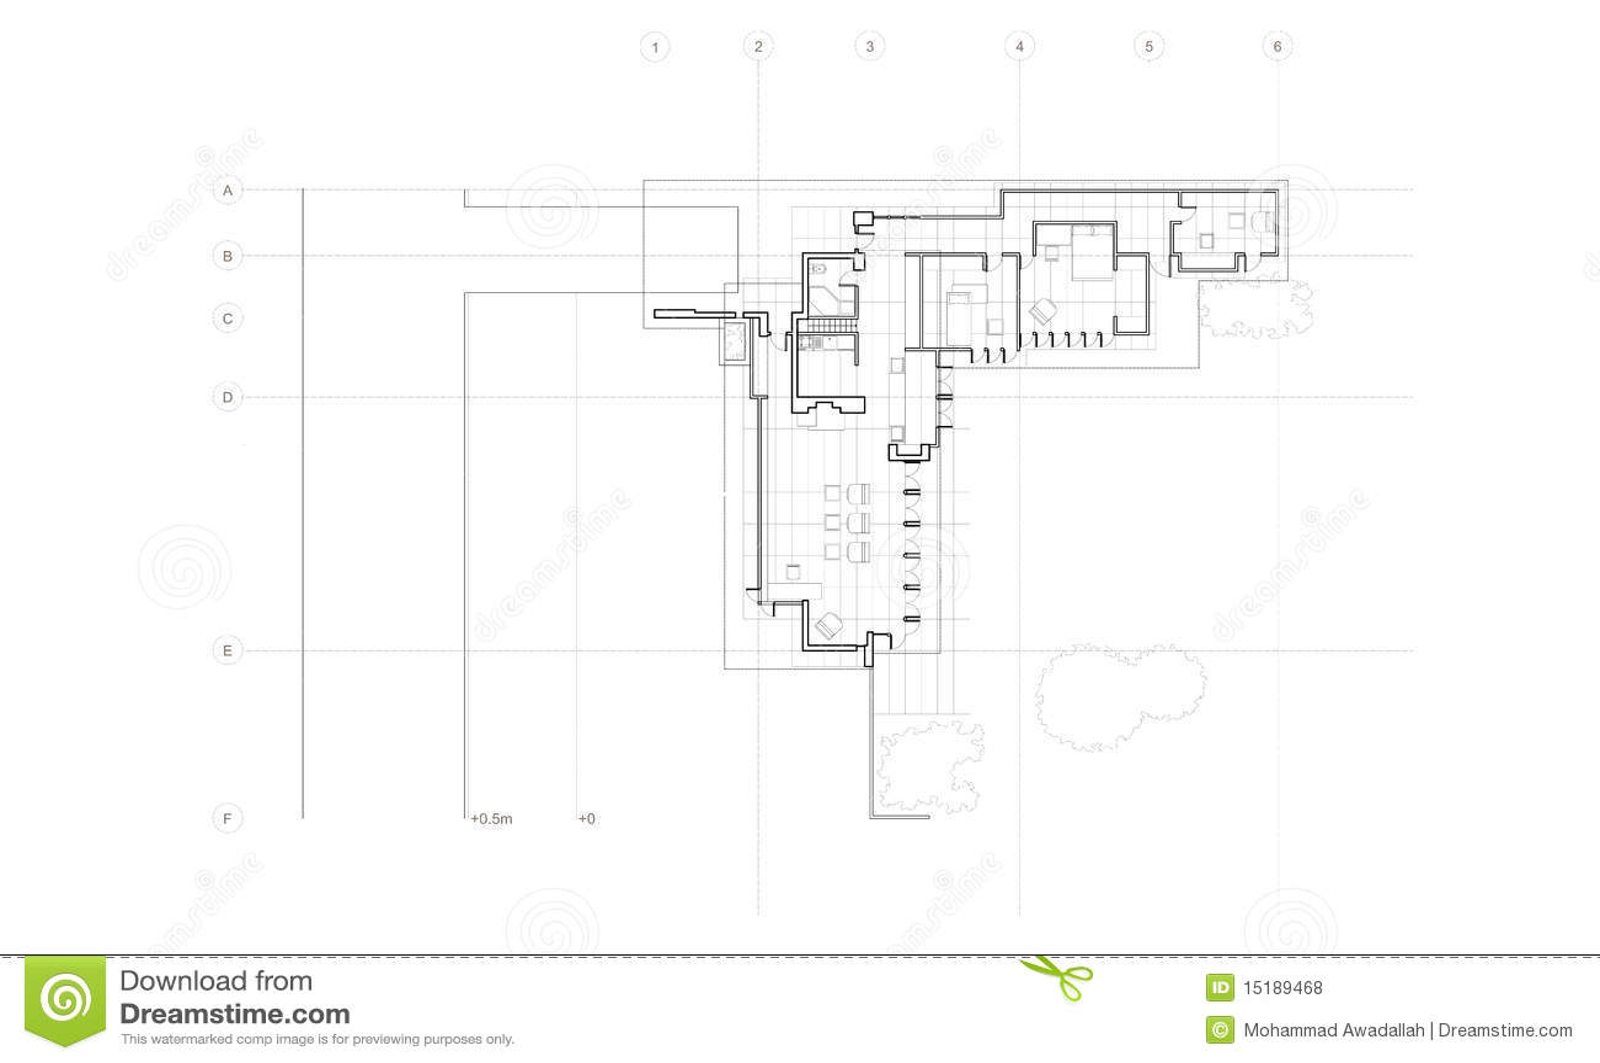 simple house diagram bulldog wiring jacobs detailed plan royalty free stock photos - image: 15189468